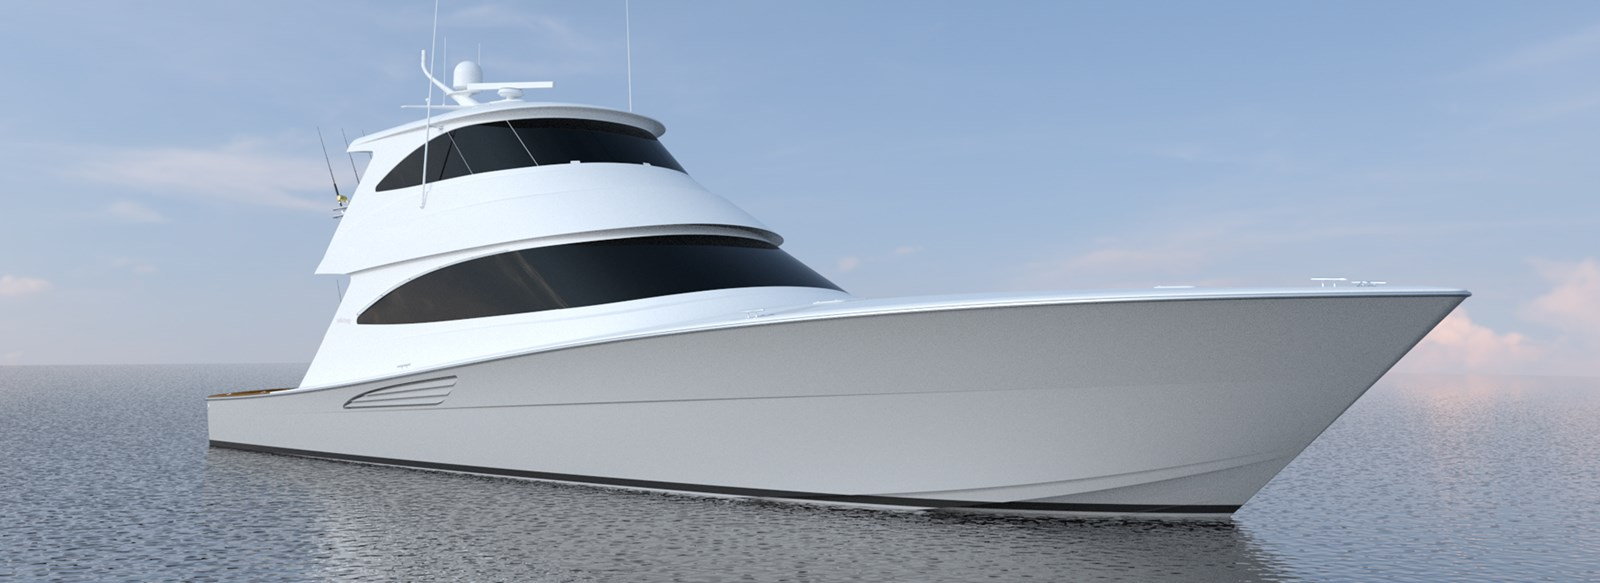 New Viking 72 Enclosed Bridge Yachts For Sale